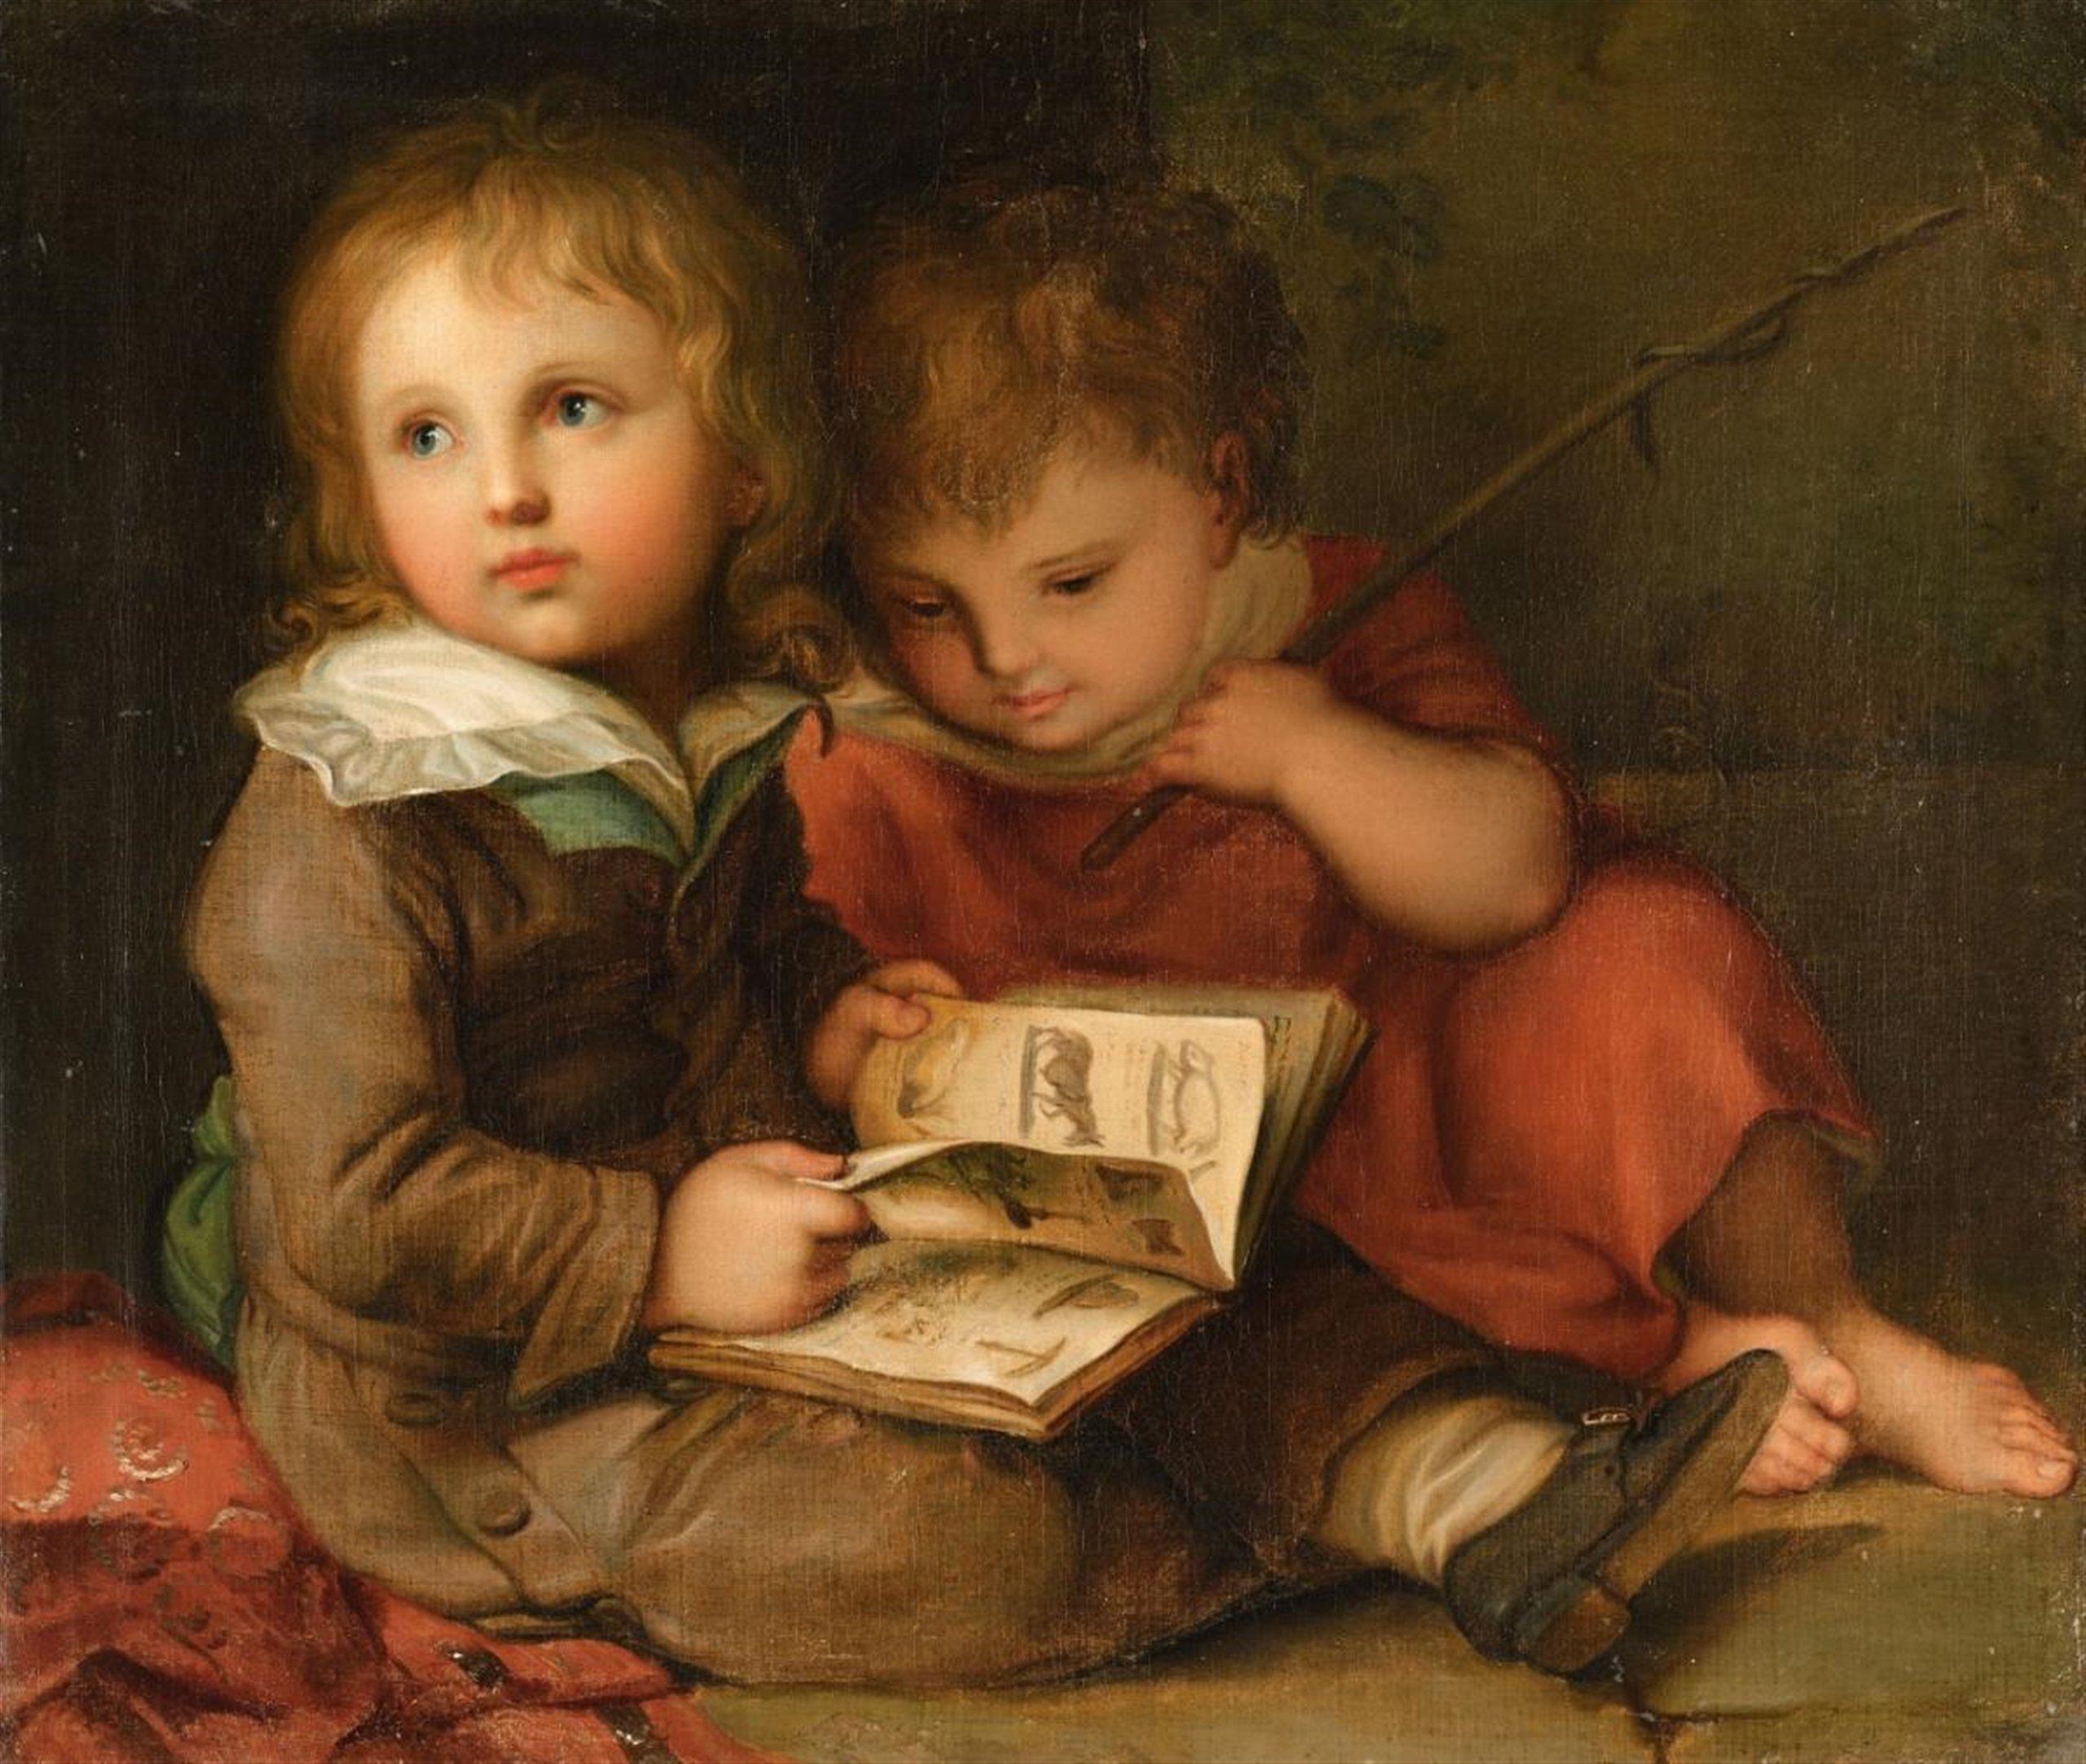 Christian Leberecht Vogel «The Painter's Children - Carl Christian and Friedrich Vogel», 1792